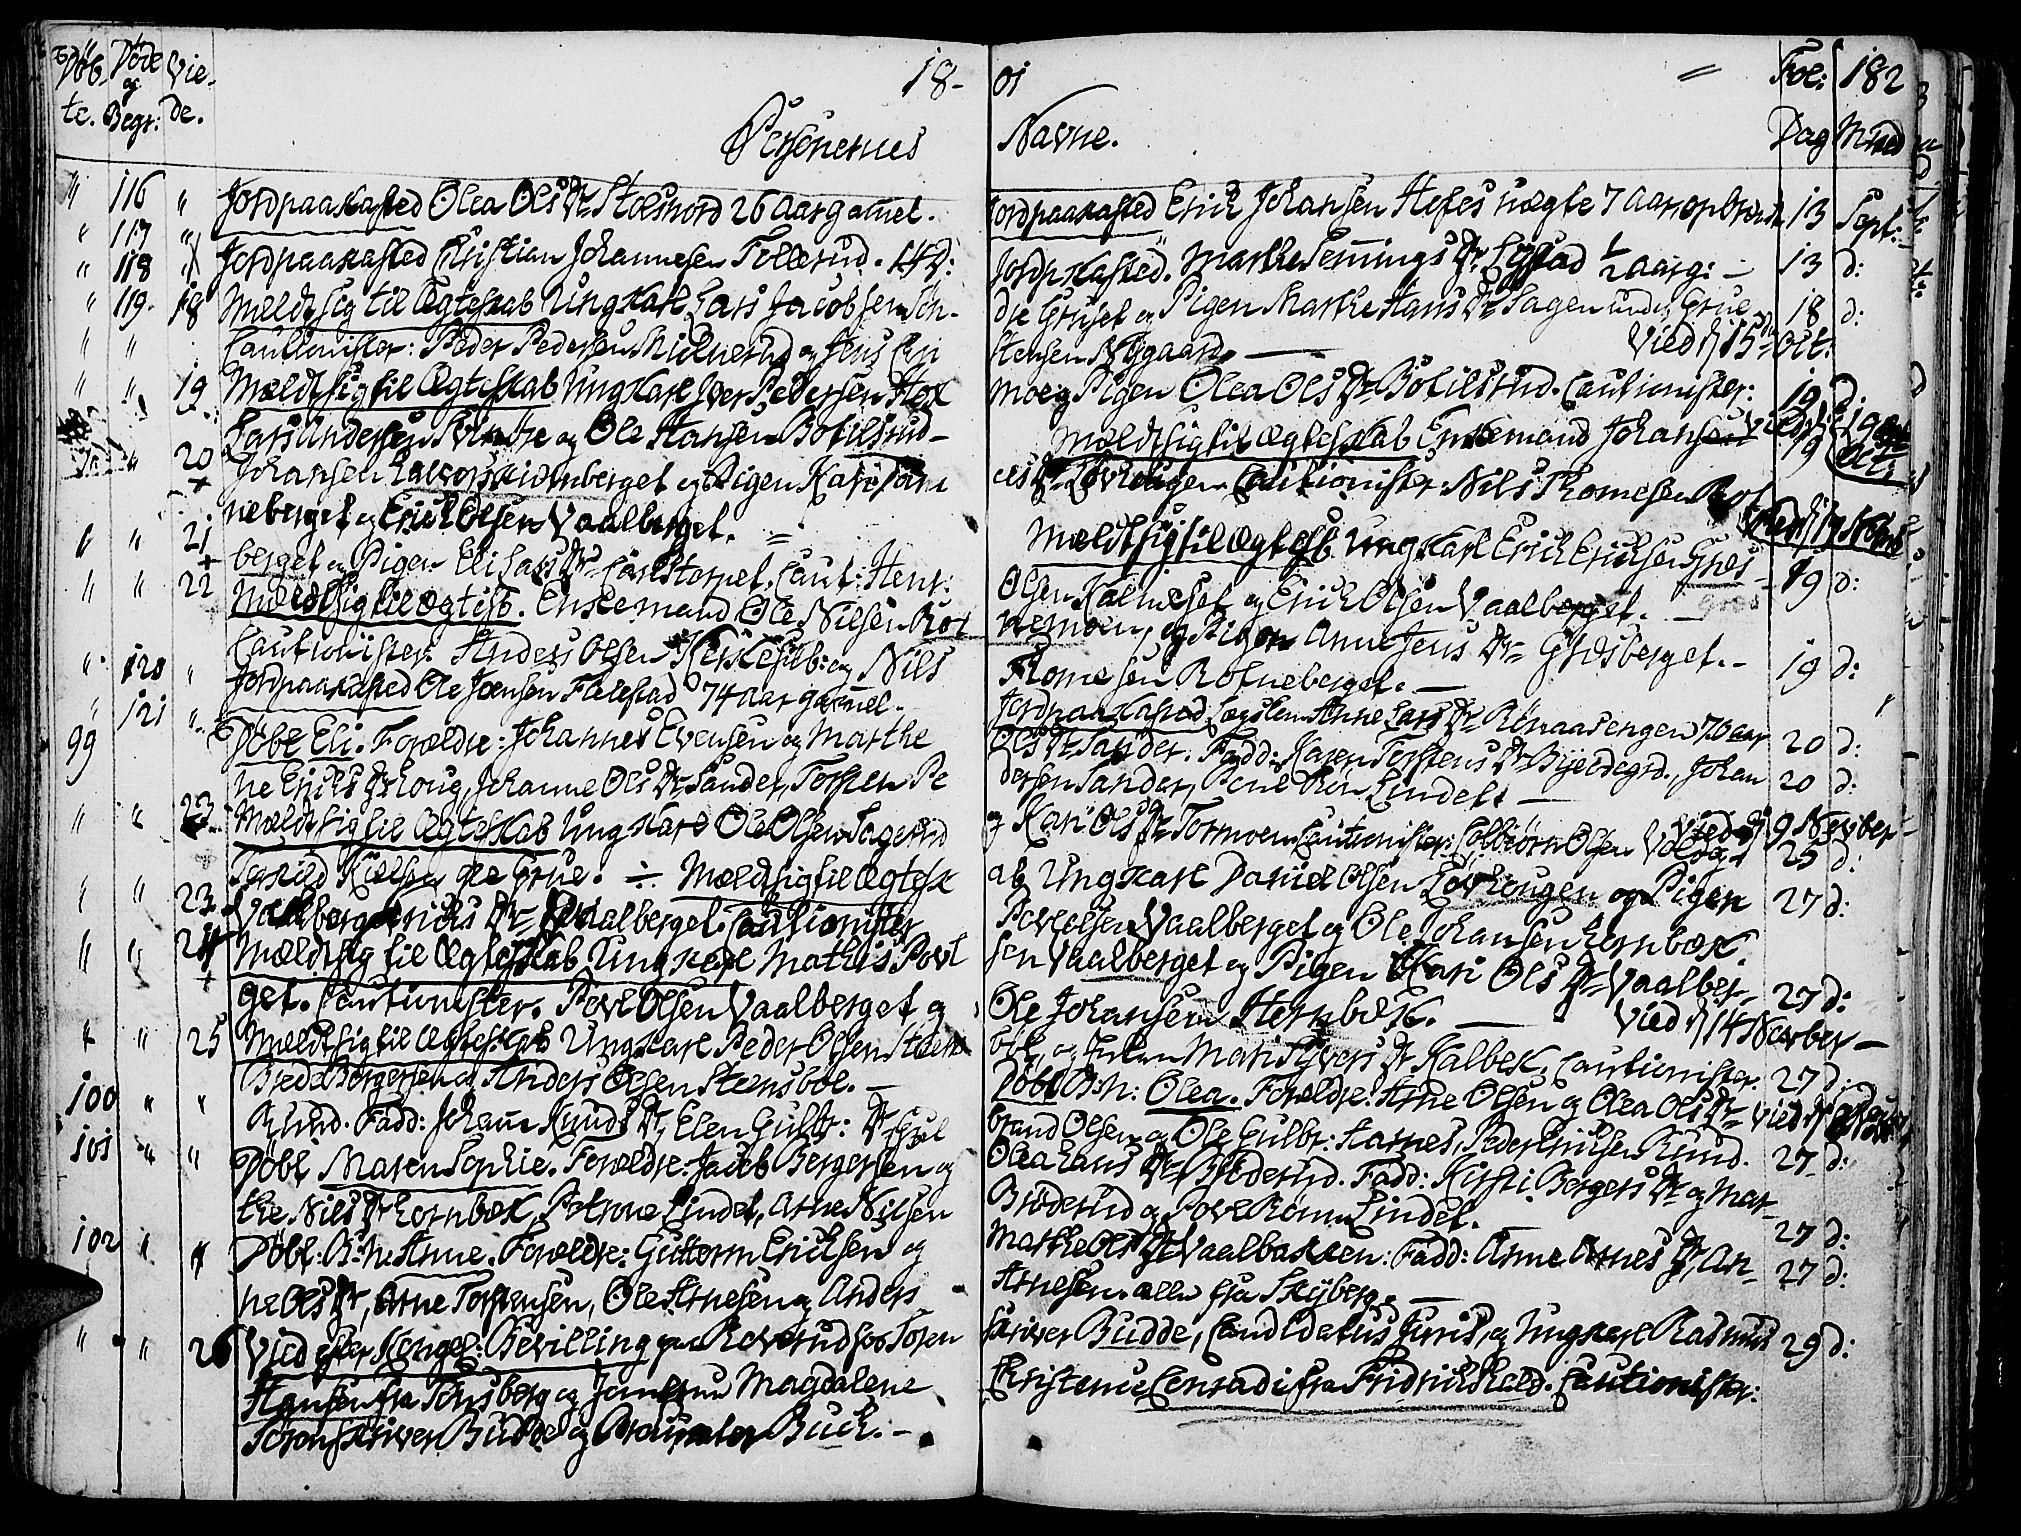 SAH, Grue prestekontor, Ministerialbok nr. 4, 1792-1805, s. 182